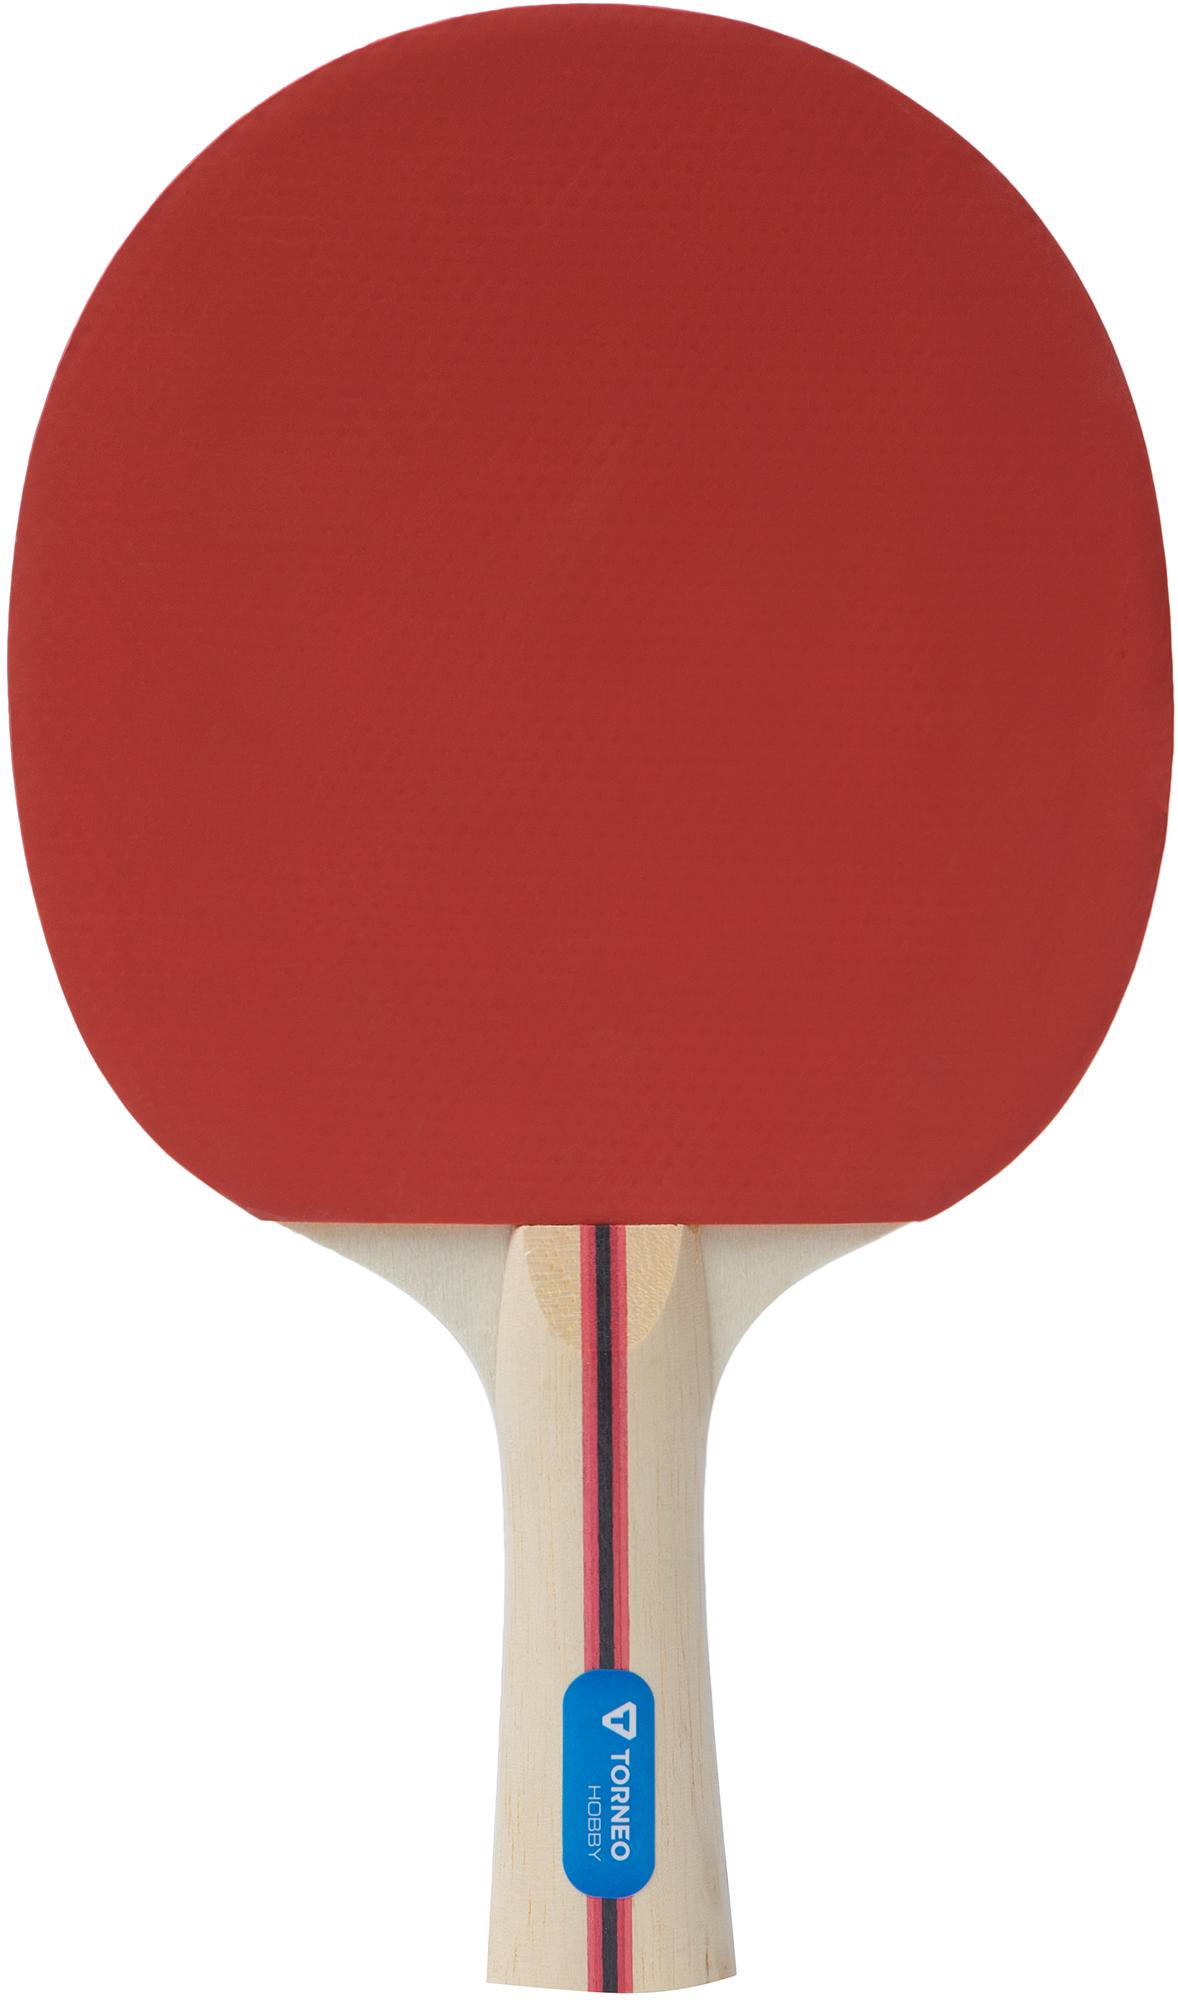 цена на Torneo Ракетка для настольного тенниса Torneo Tour